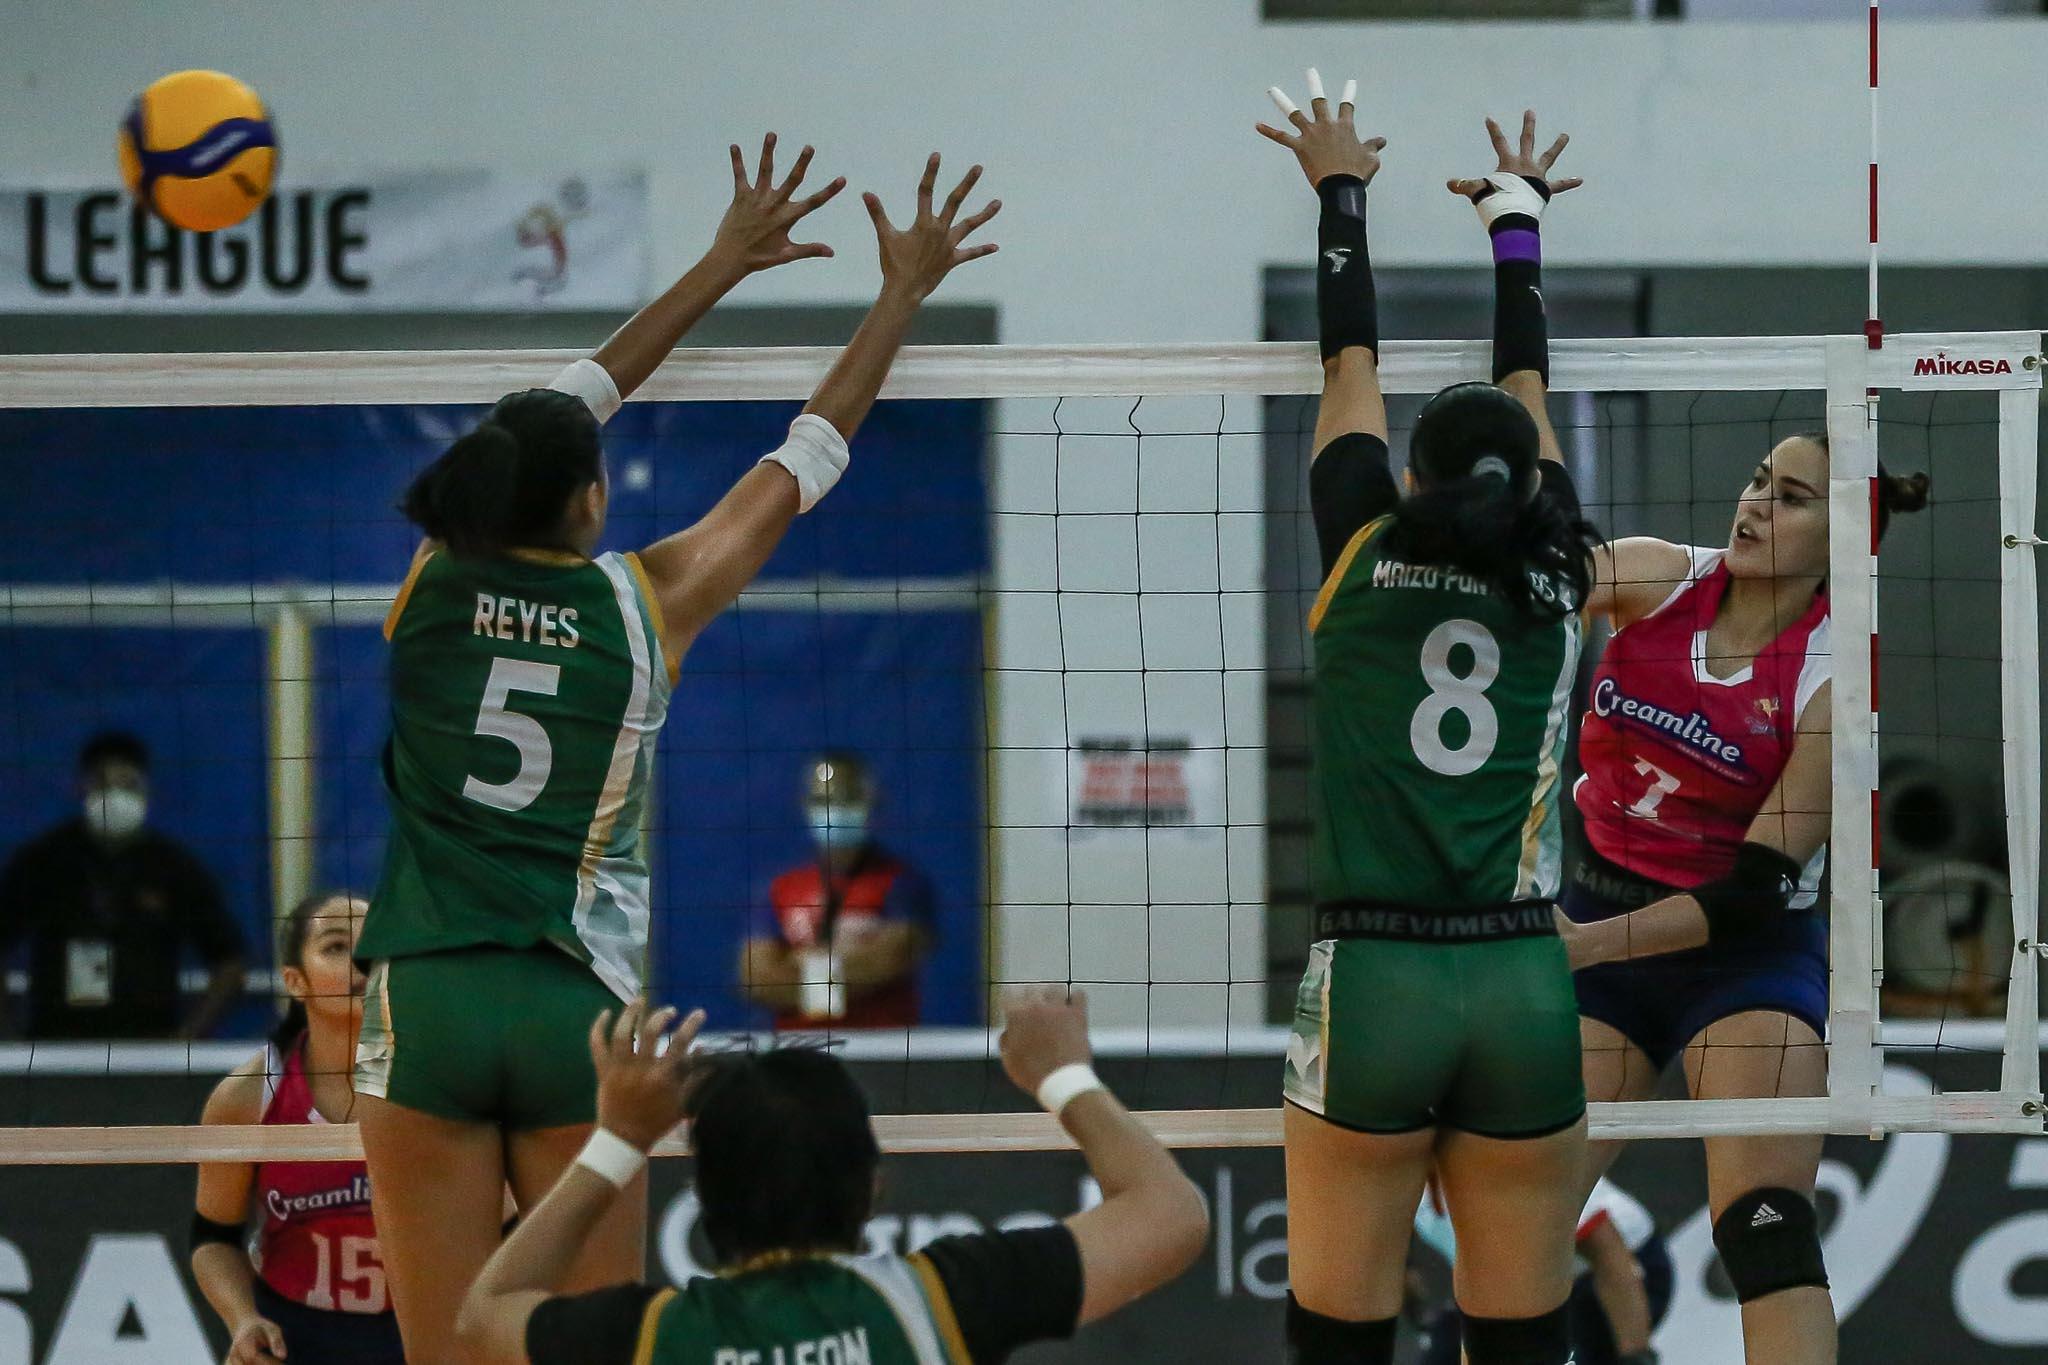 PVL-2021-Sta.-Lucia-vs-Creamline-Michele-Gumabao-Creamline Michele Gumabao credits Creamline coaches for sensational PVL return News PVL Volleyball  - philippine sports news